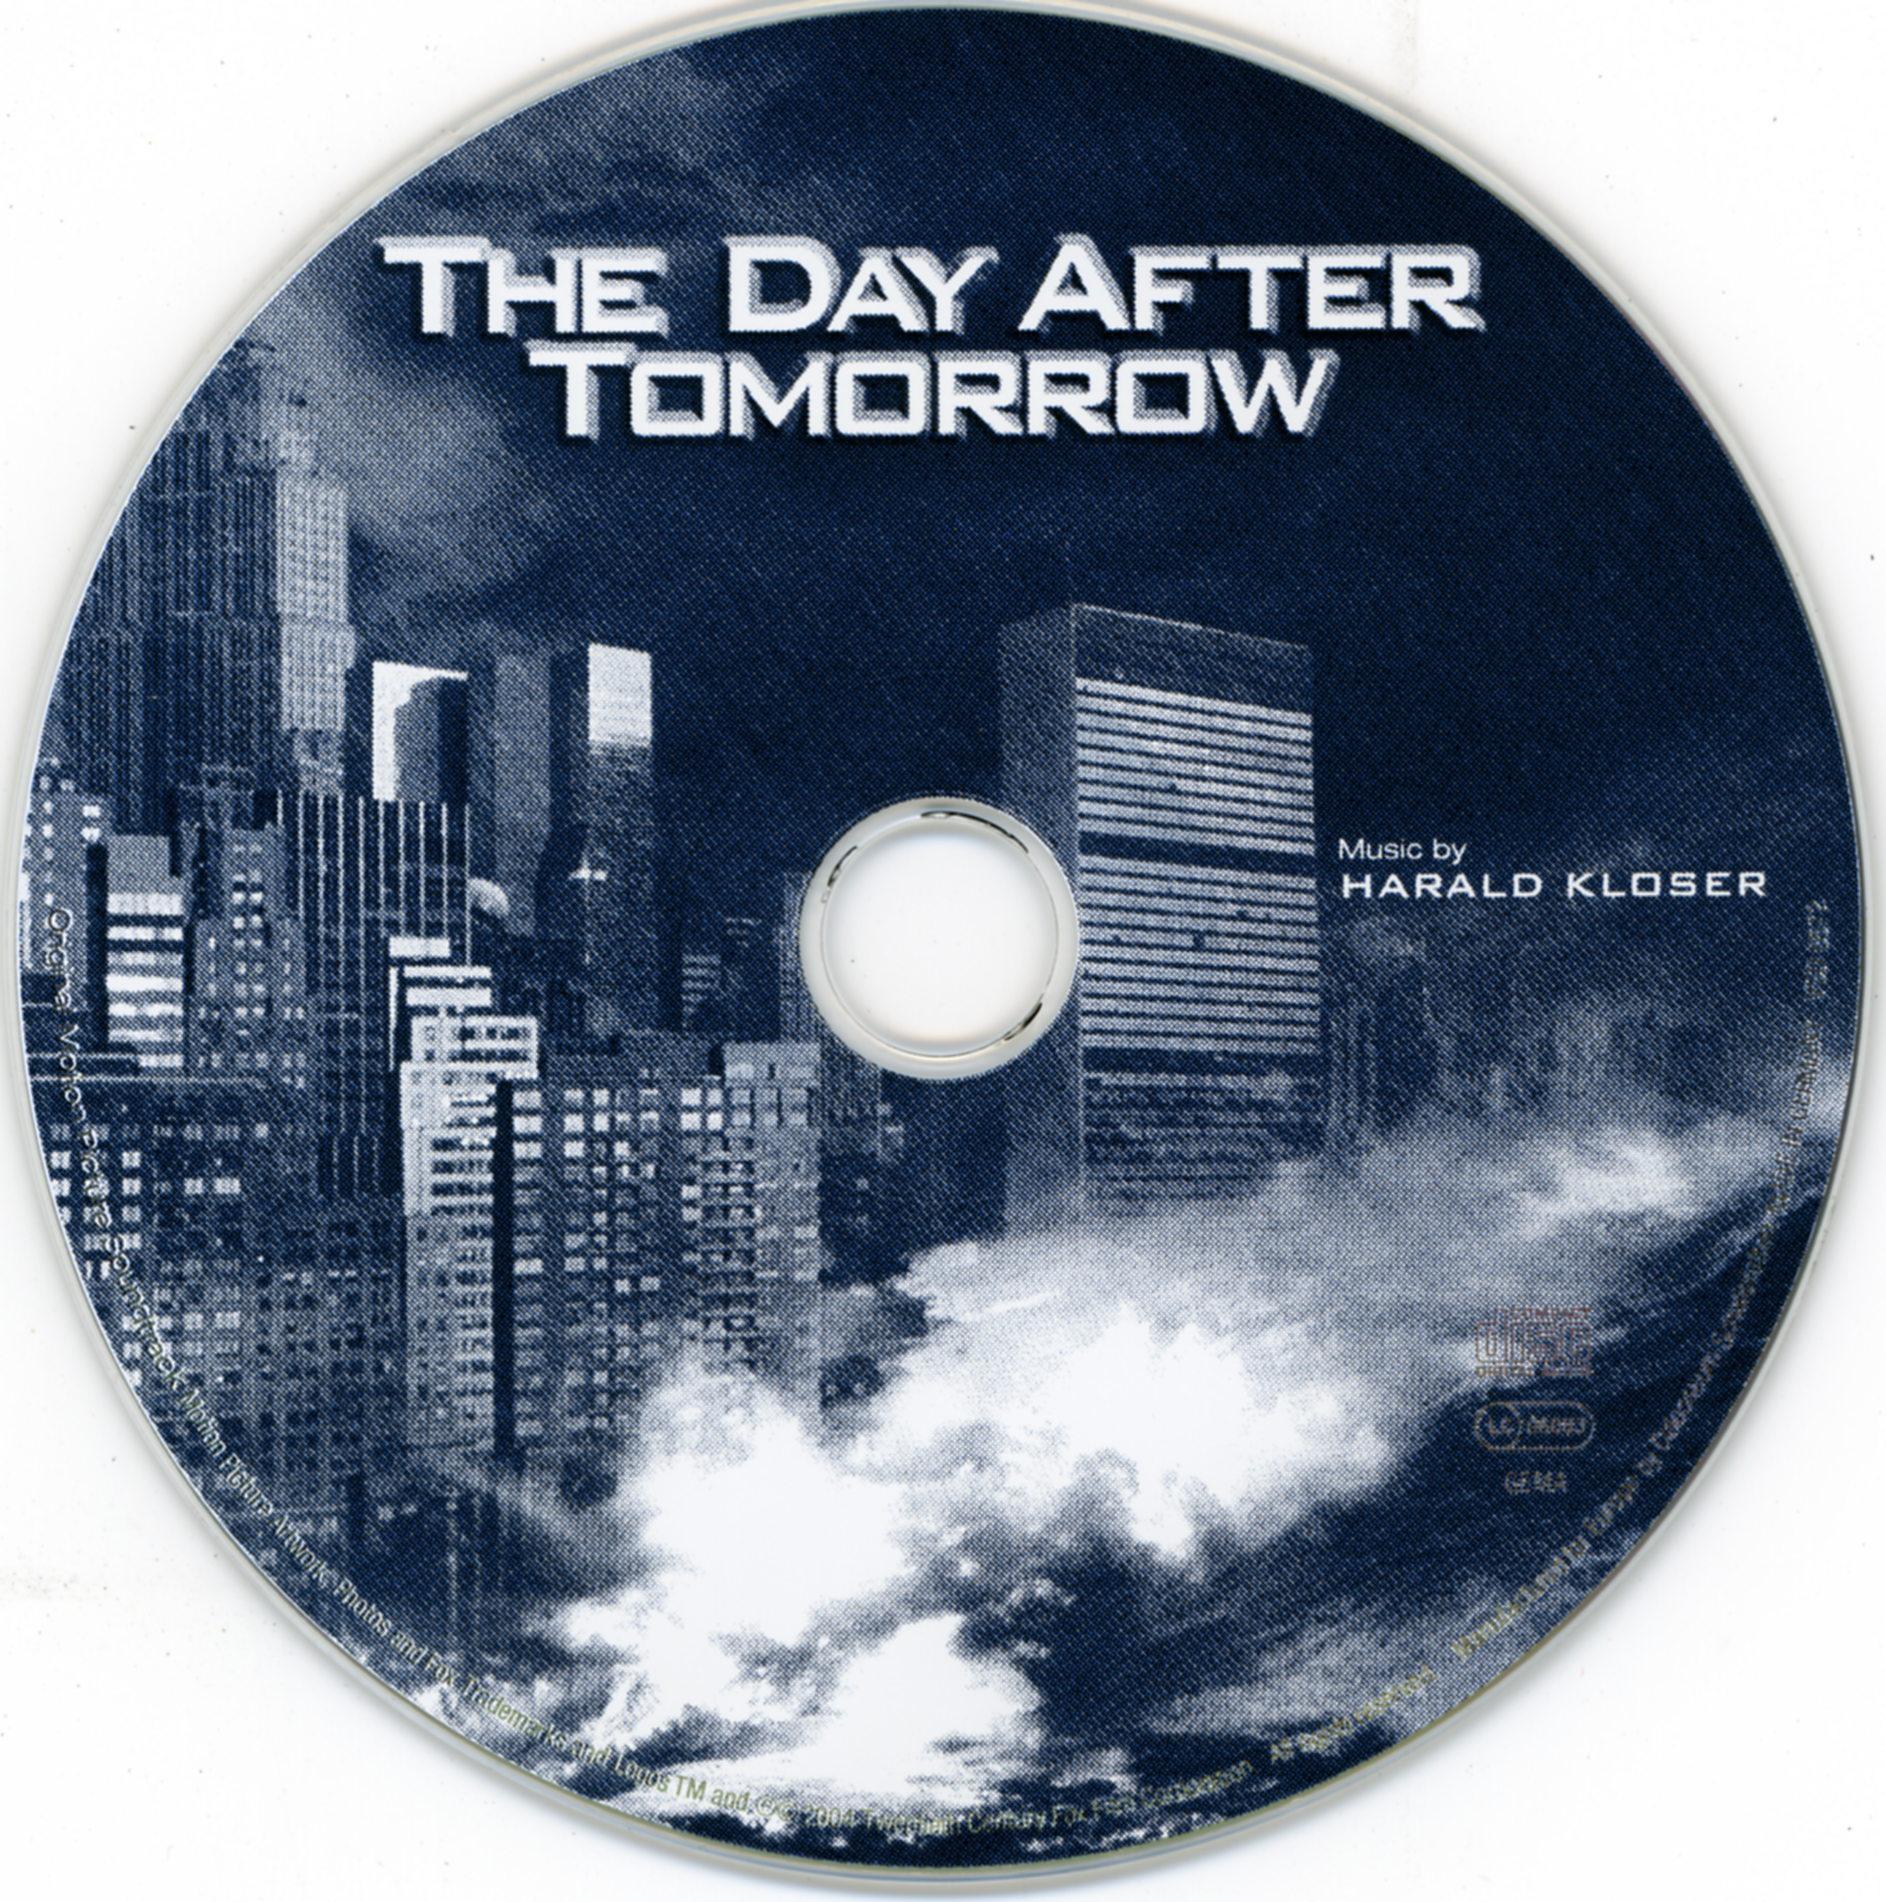 day after tomorrow On the day after tomorrow in two days - translation entry arabic: بَعْدَ غَد  (baʿda ḡad) egyptian arabic: بعد بكره.